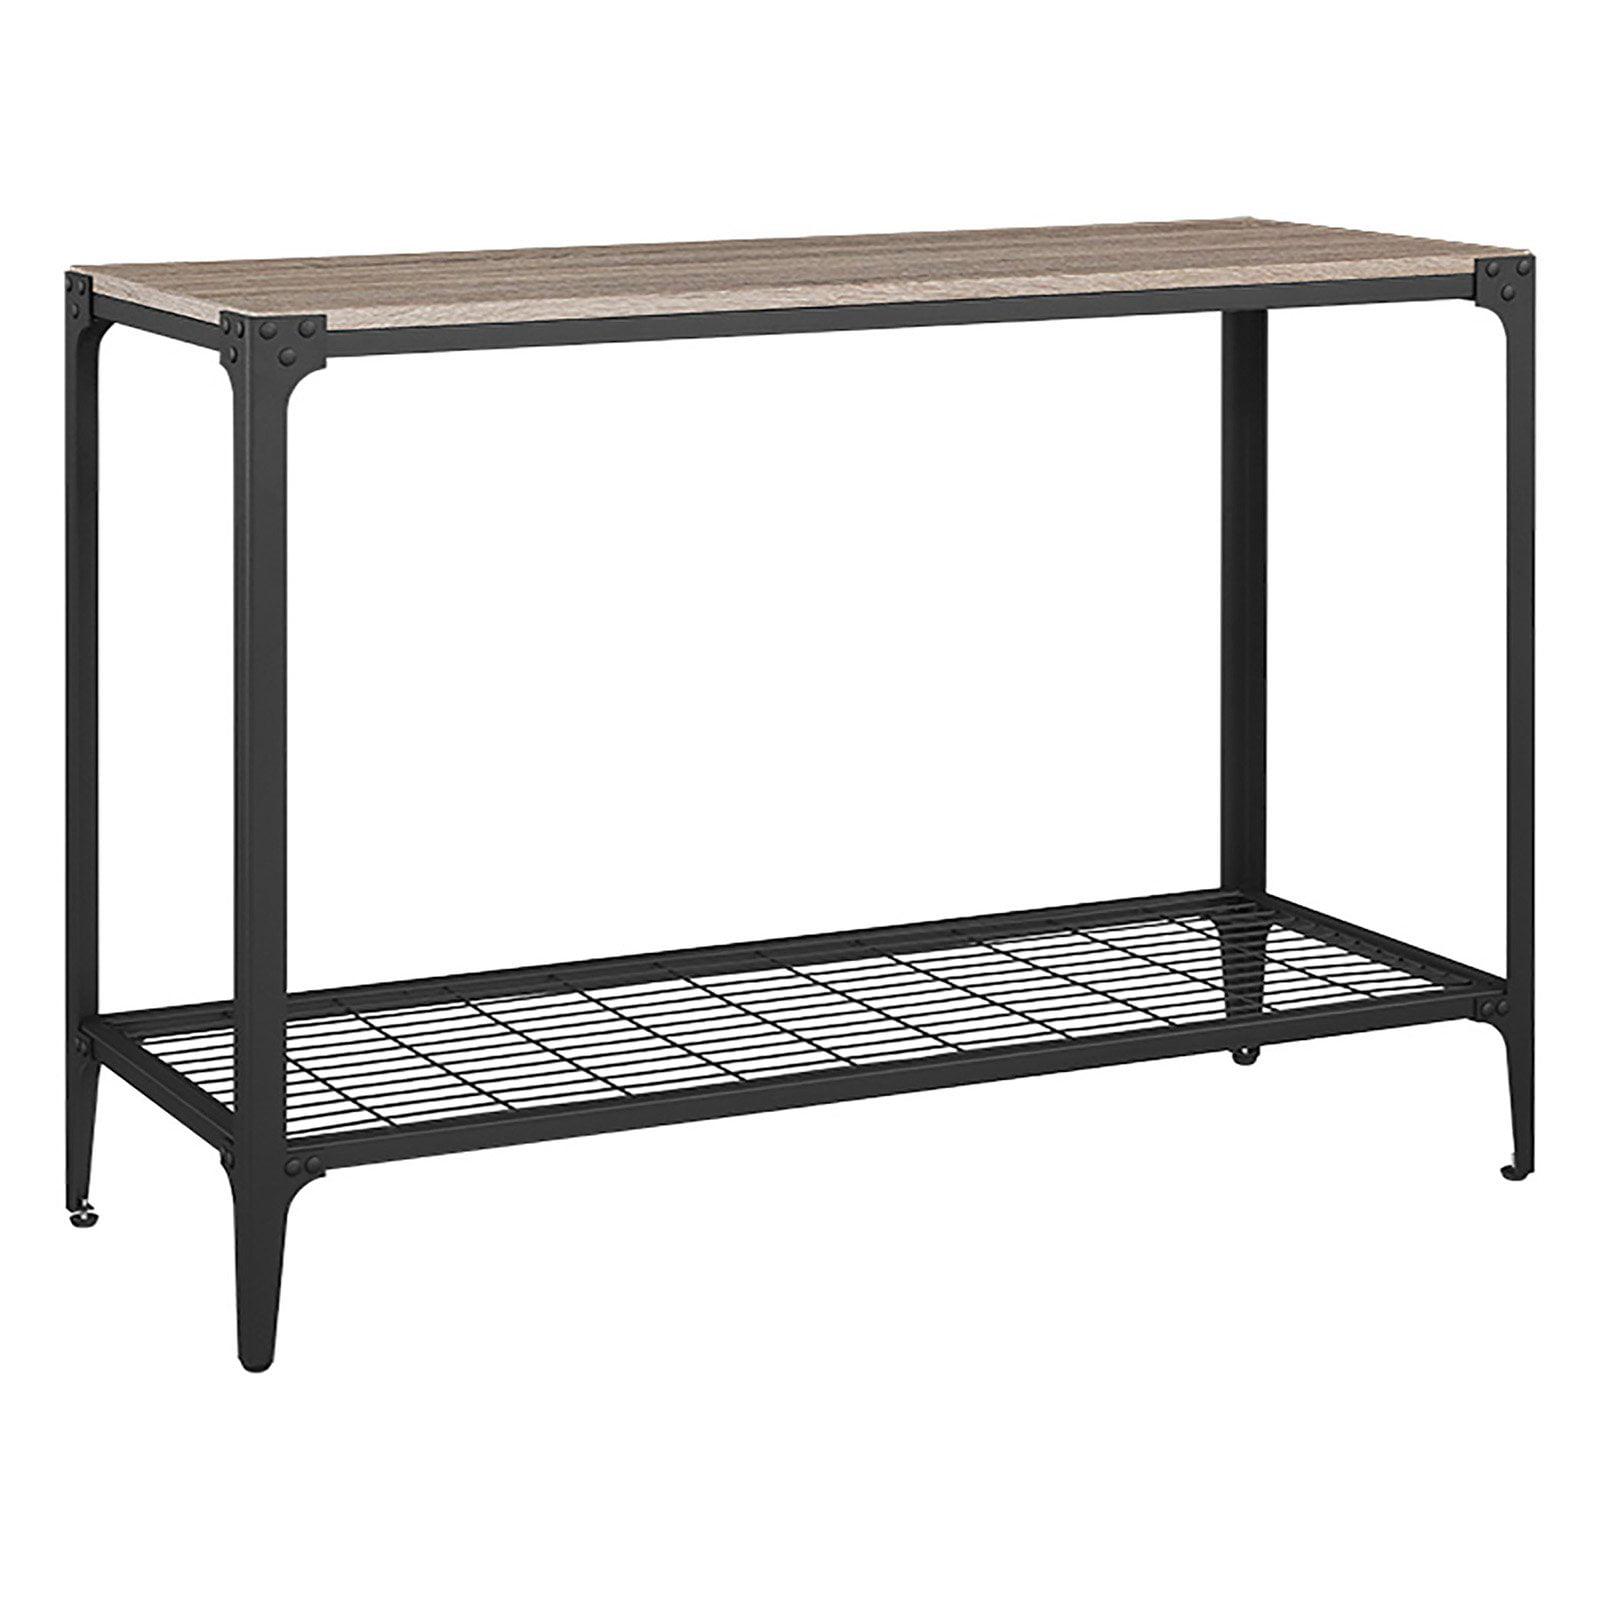 Walker Edison Angle Rustic Sofa Table